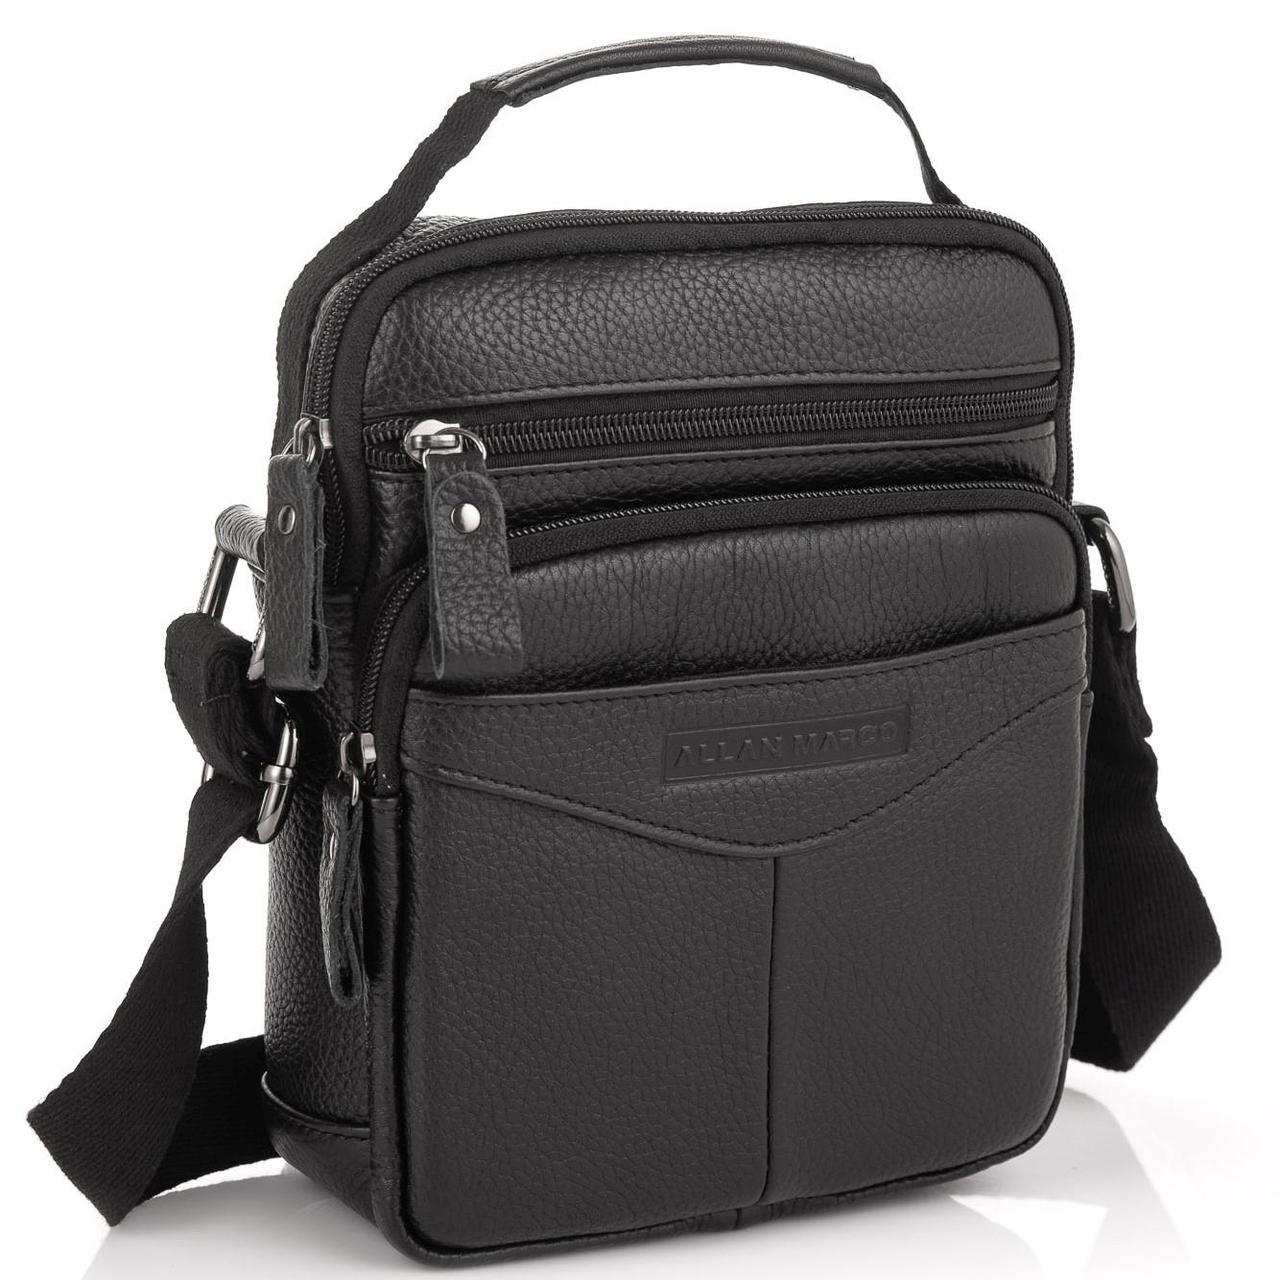 Кожаная мужская сумка-мессенджер черная Allan Marco RR-9055A